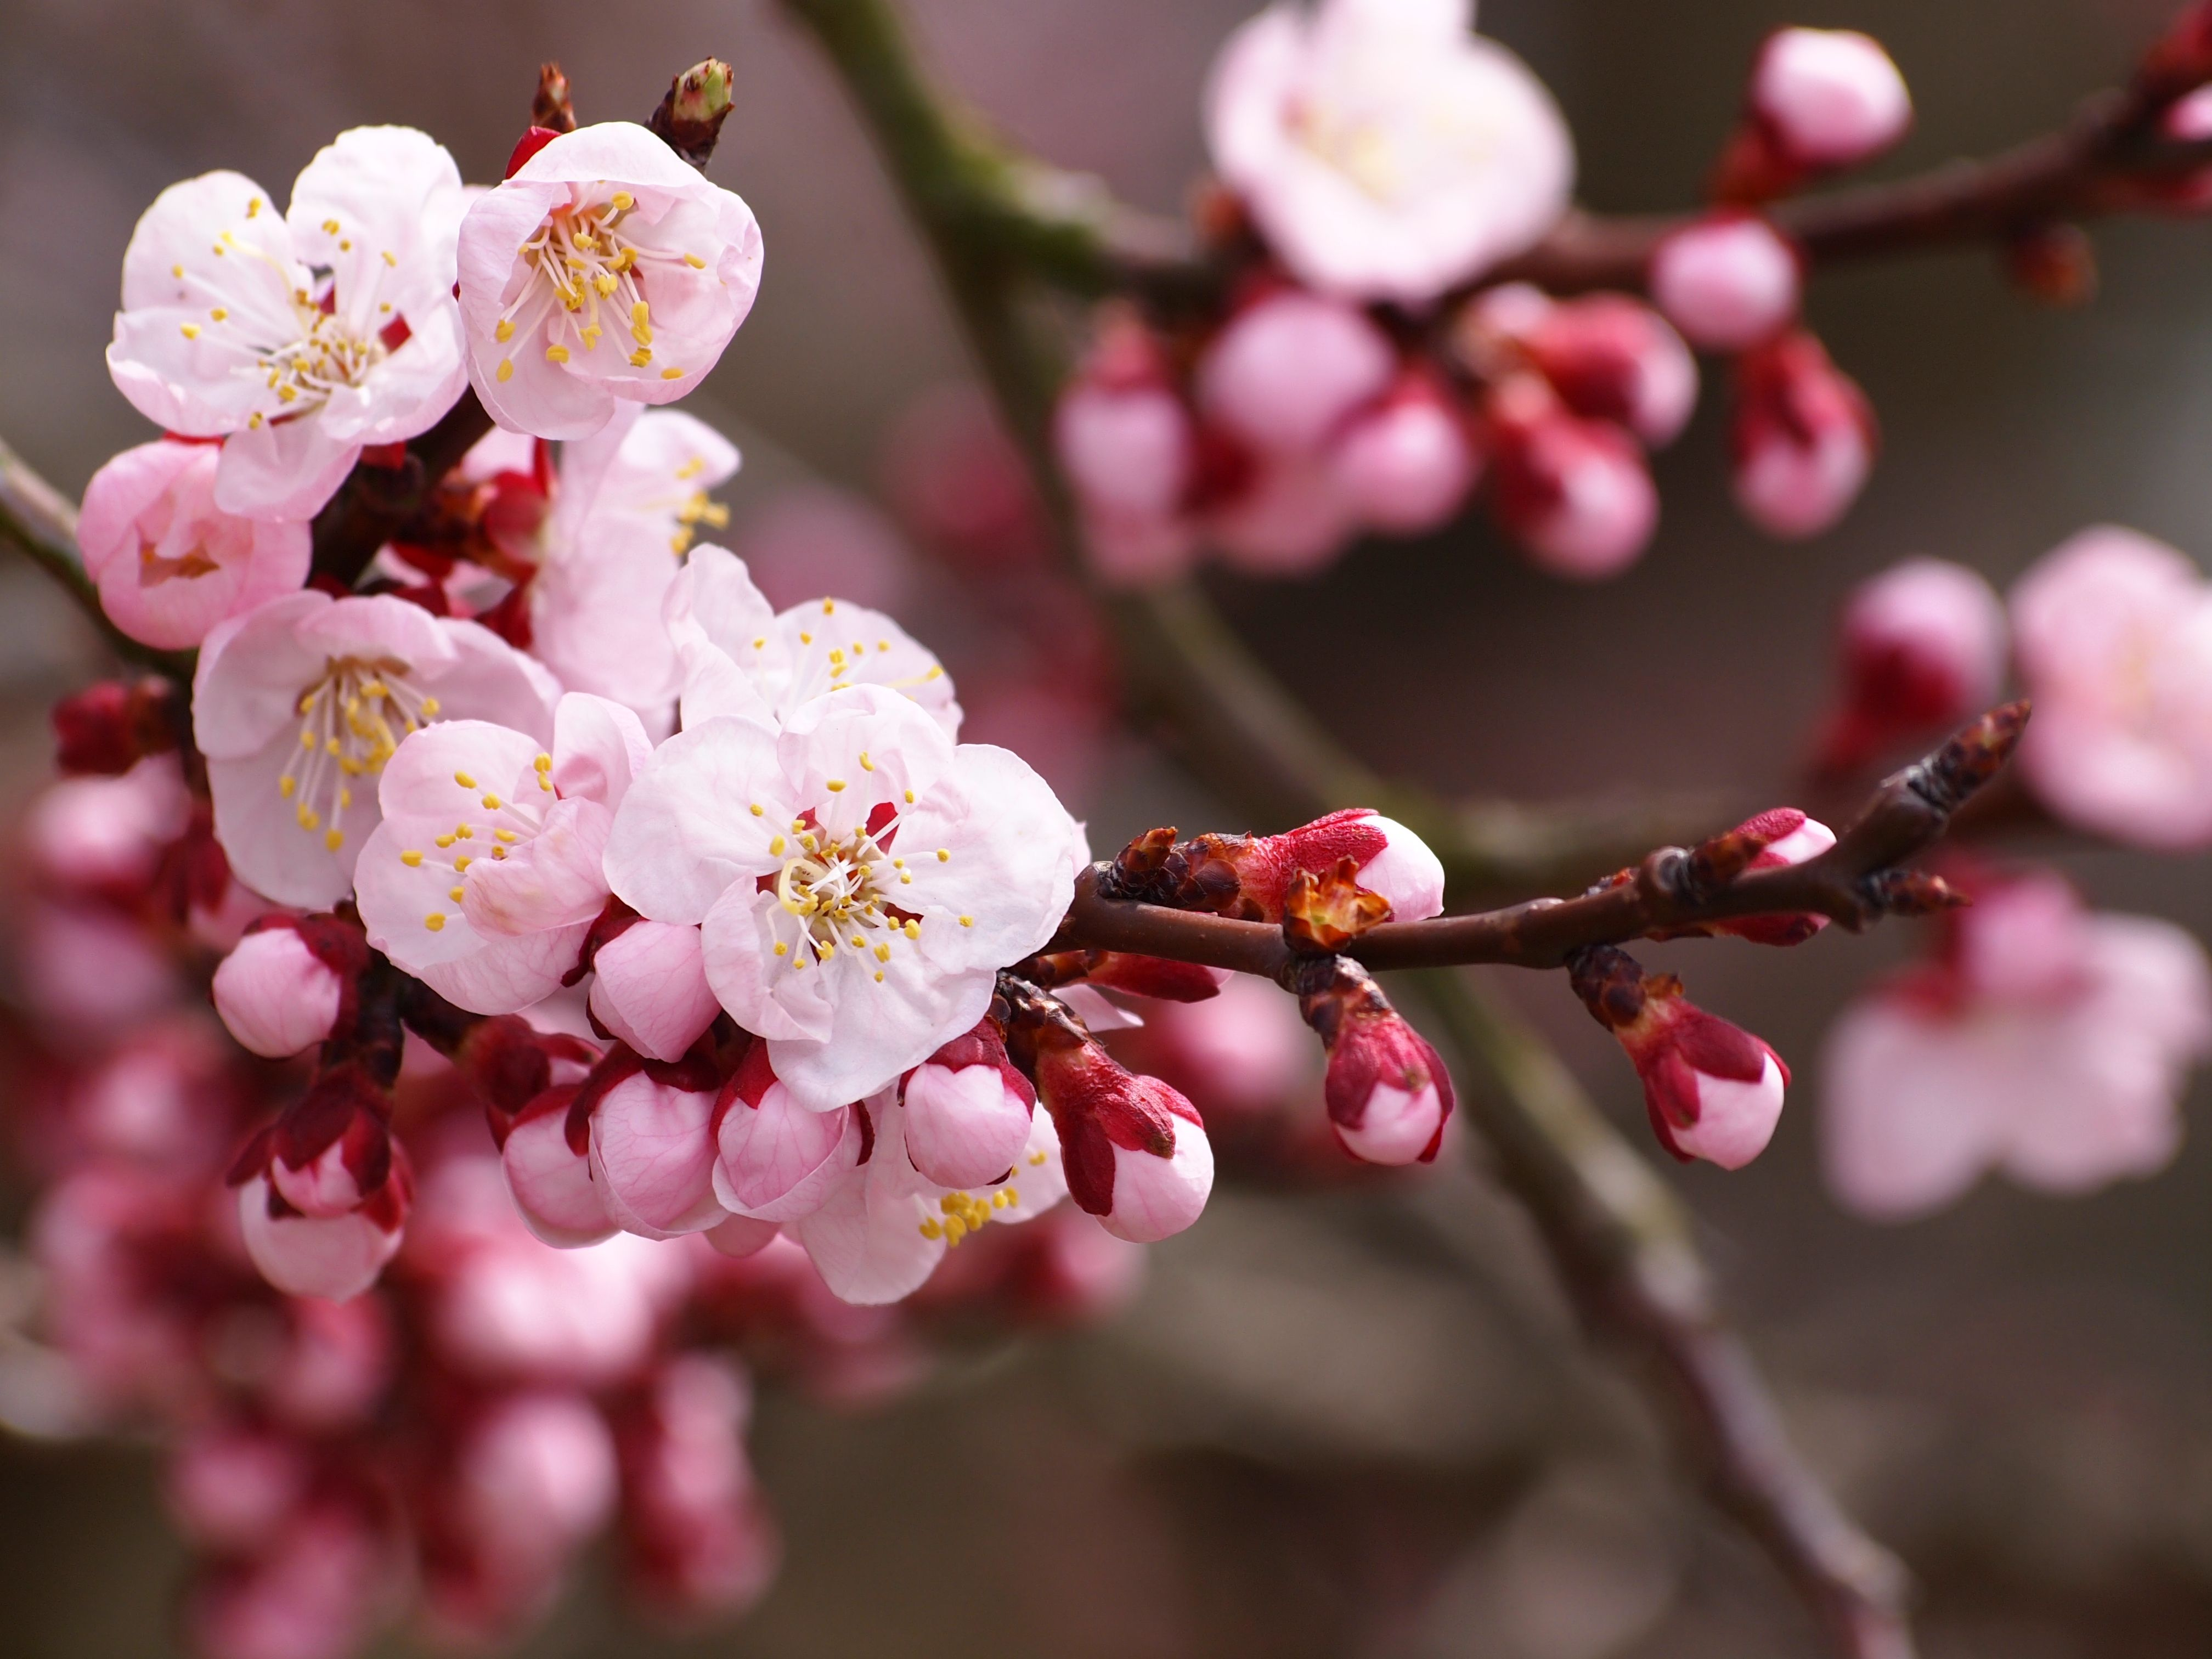 Apricot Blossoms Jpg 4032 3024 Cherry Blossom Wallpaper Apricot Blossom Cherry Blossom Flowers